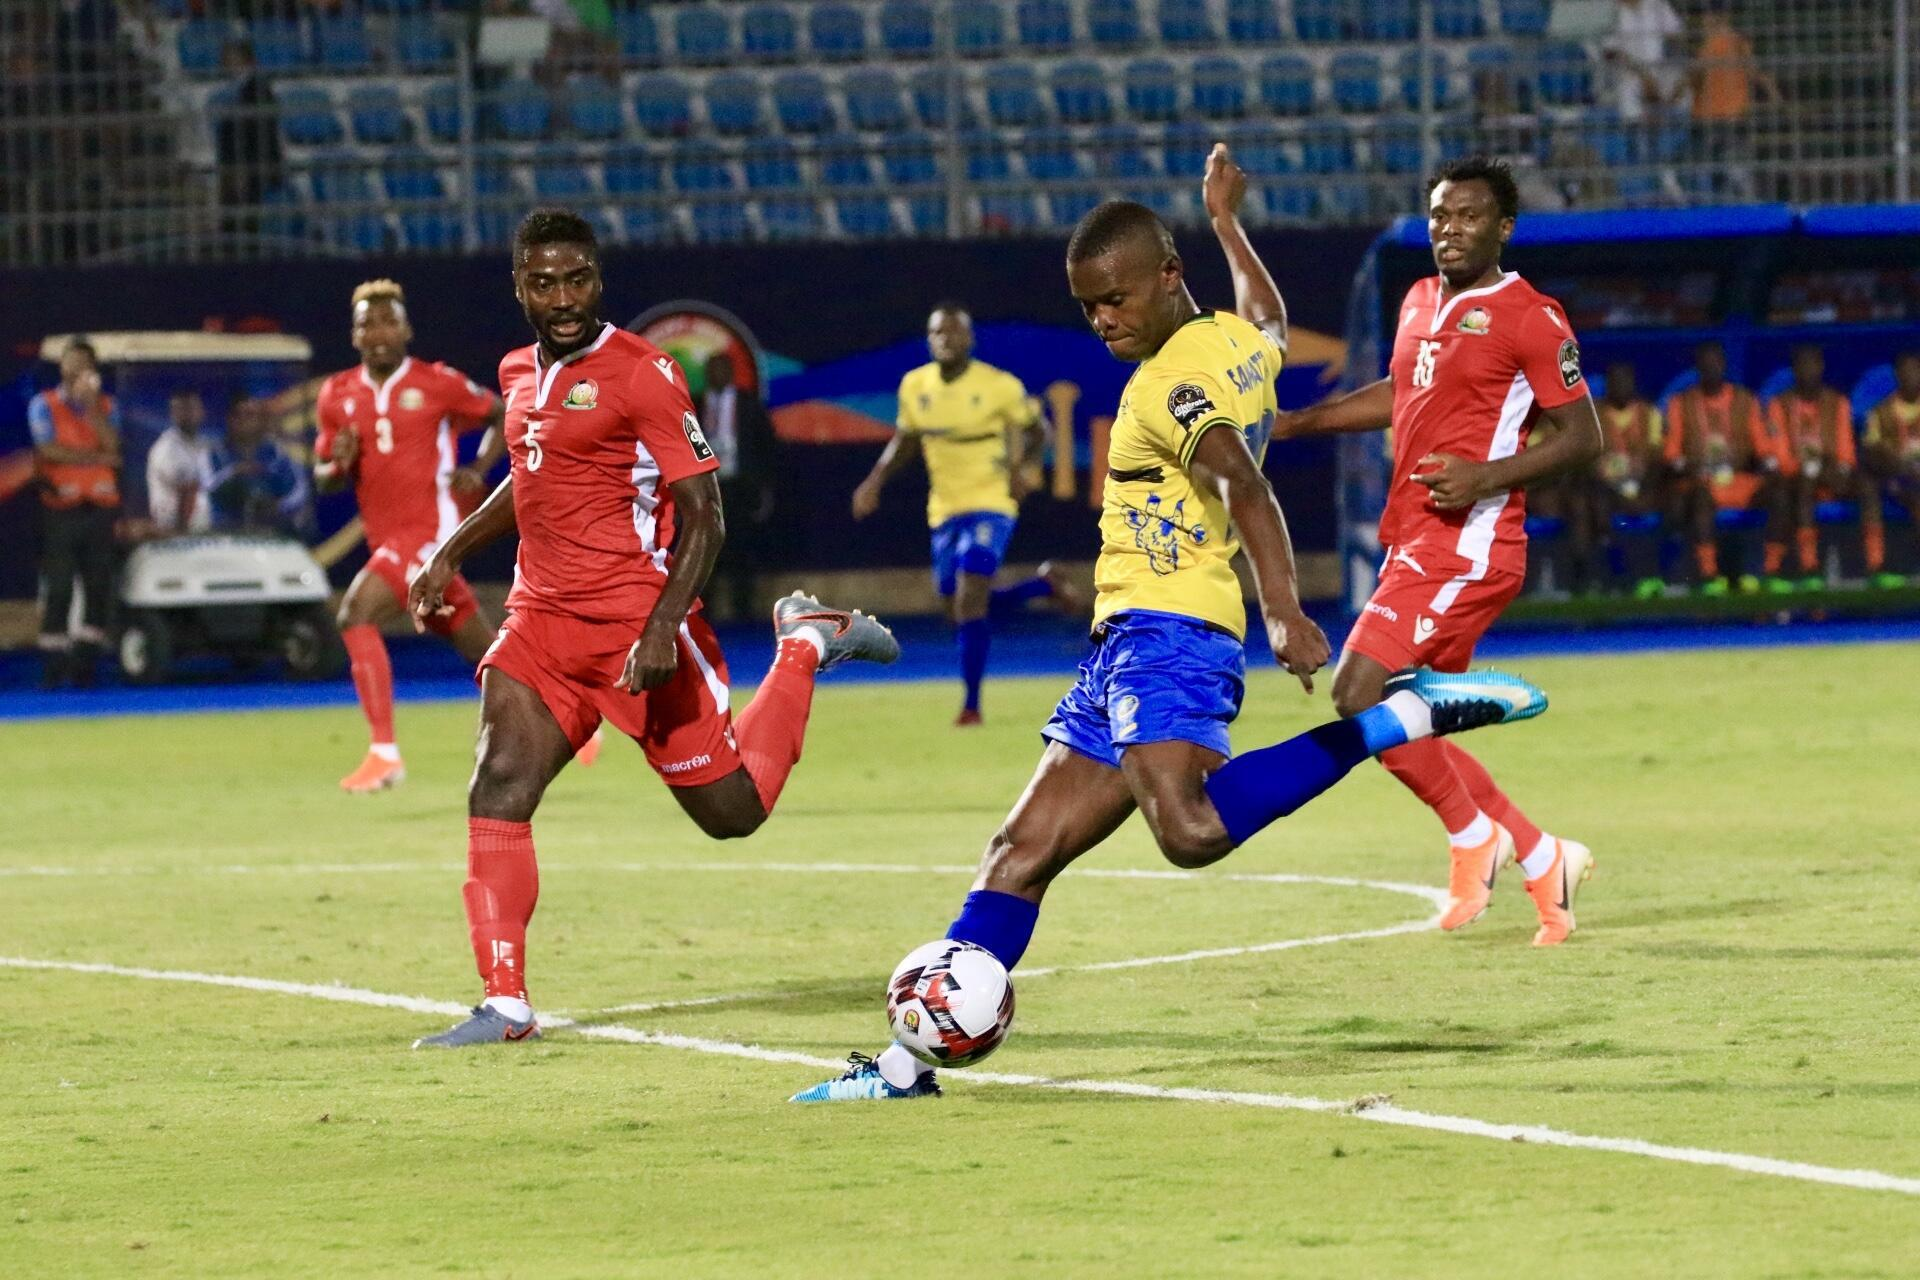 Tanzania skipper Mbwana Samatta gave his side a 2-1 lead in the pulsating encounter agaisnt Kenya who ultimately won 3-2.